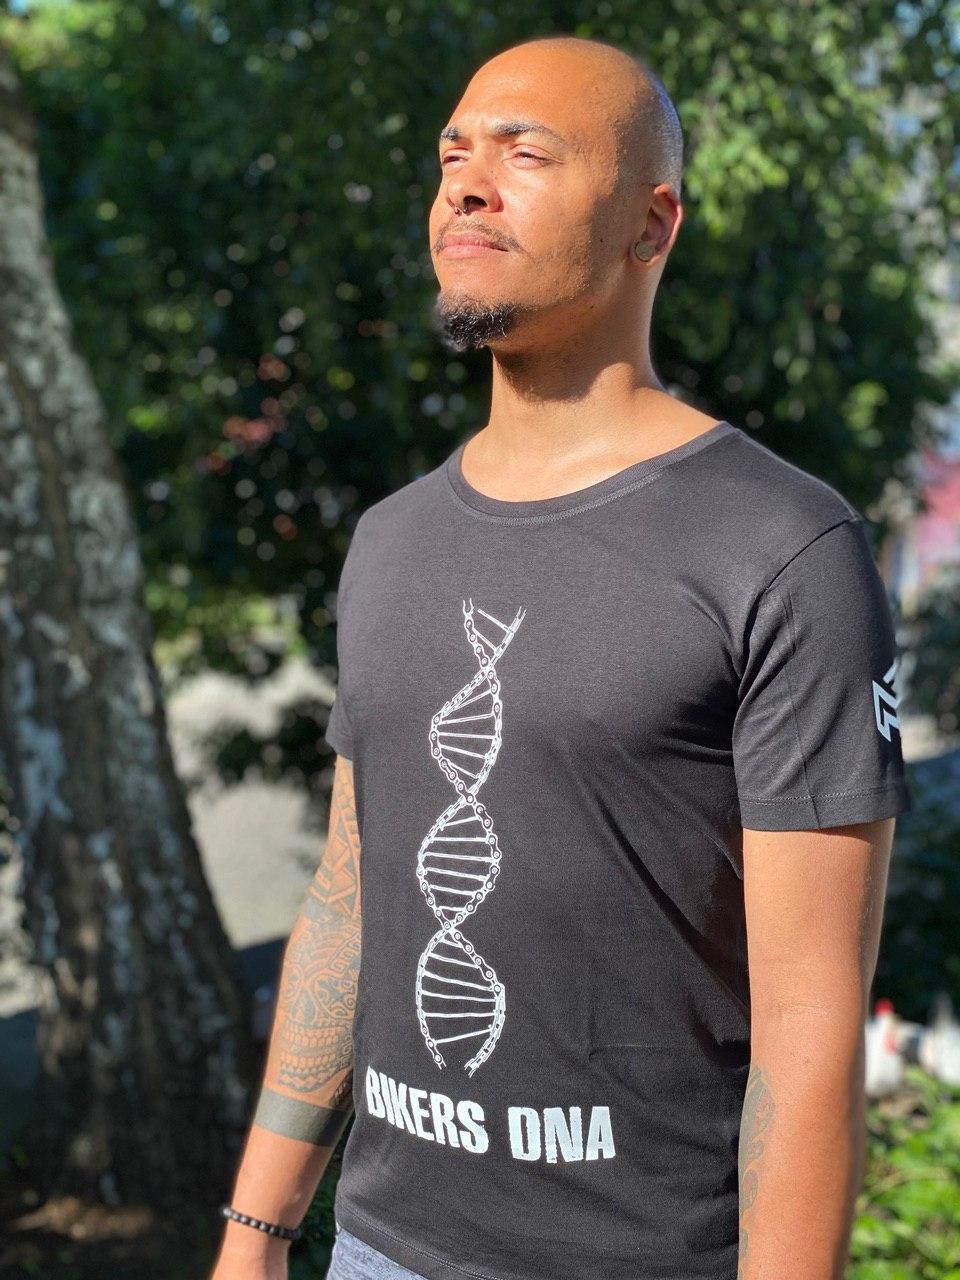 Ettersmountain Drivers DNA